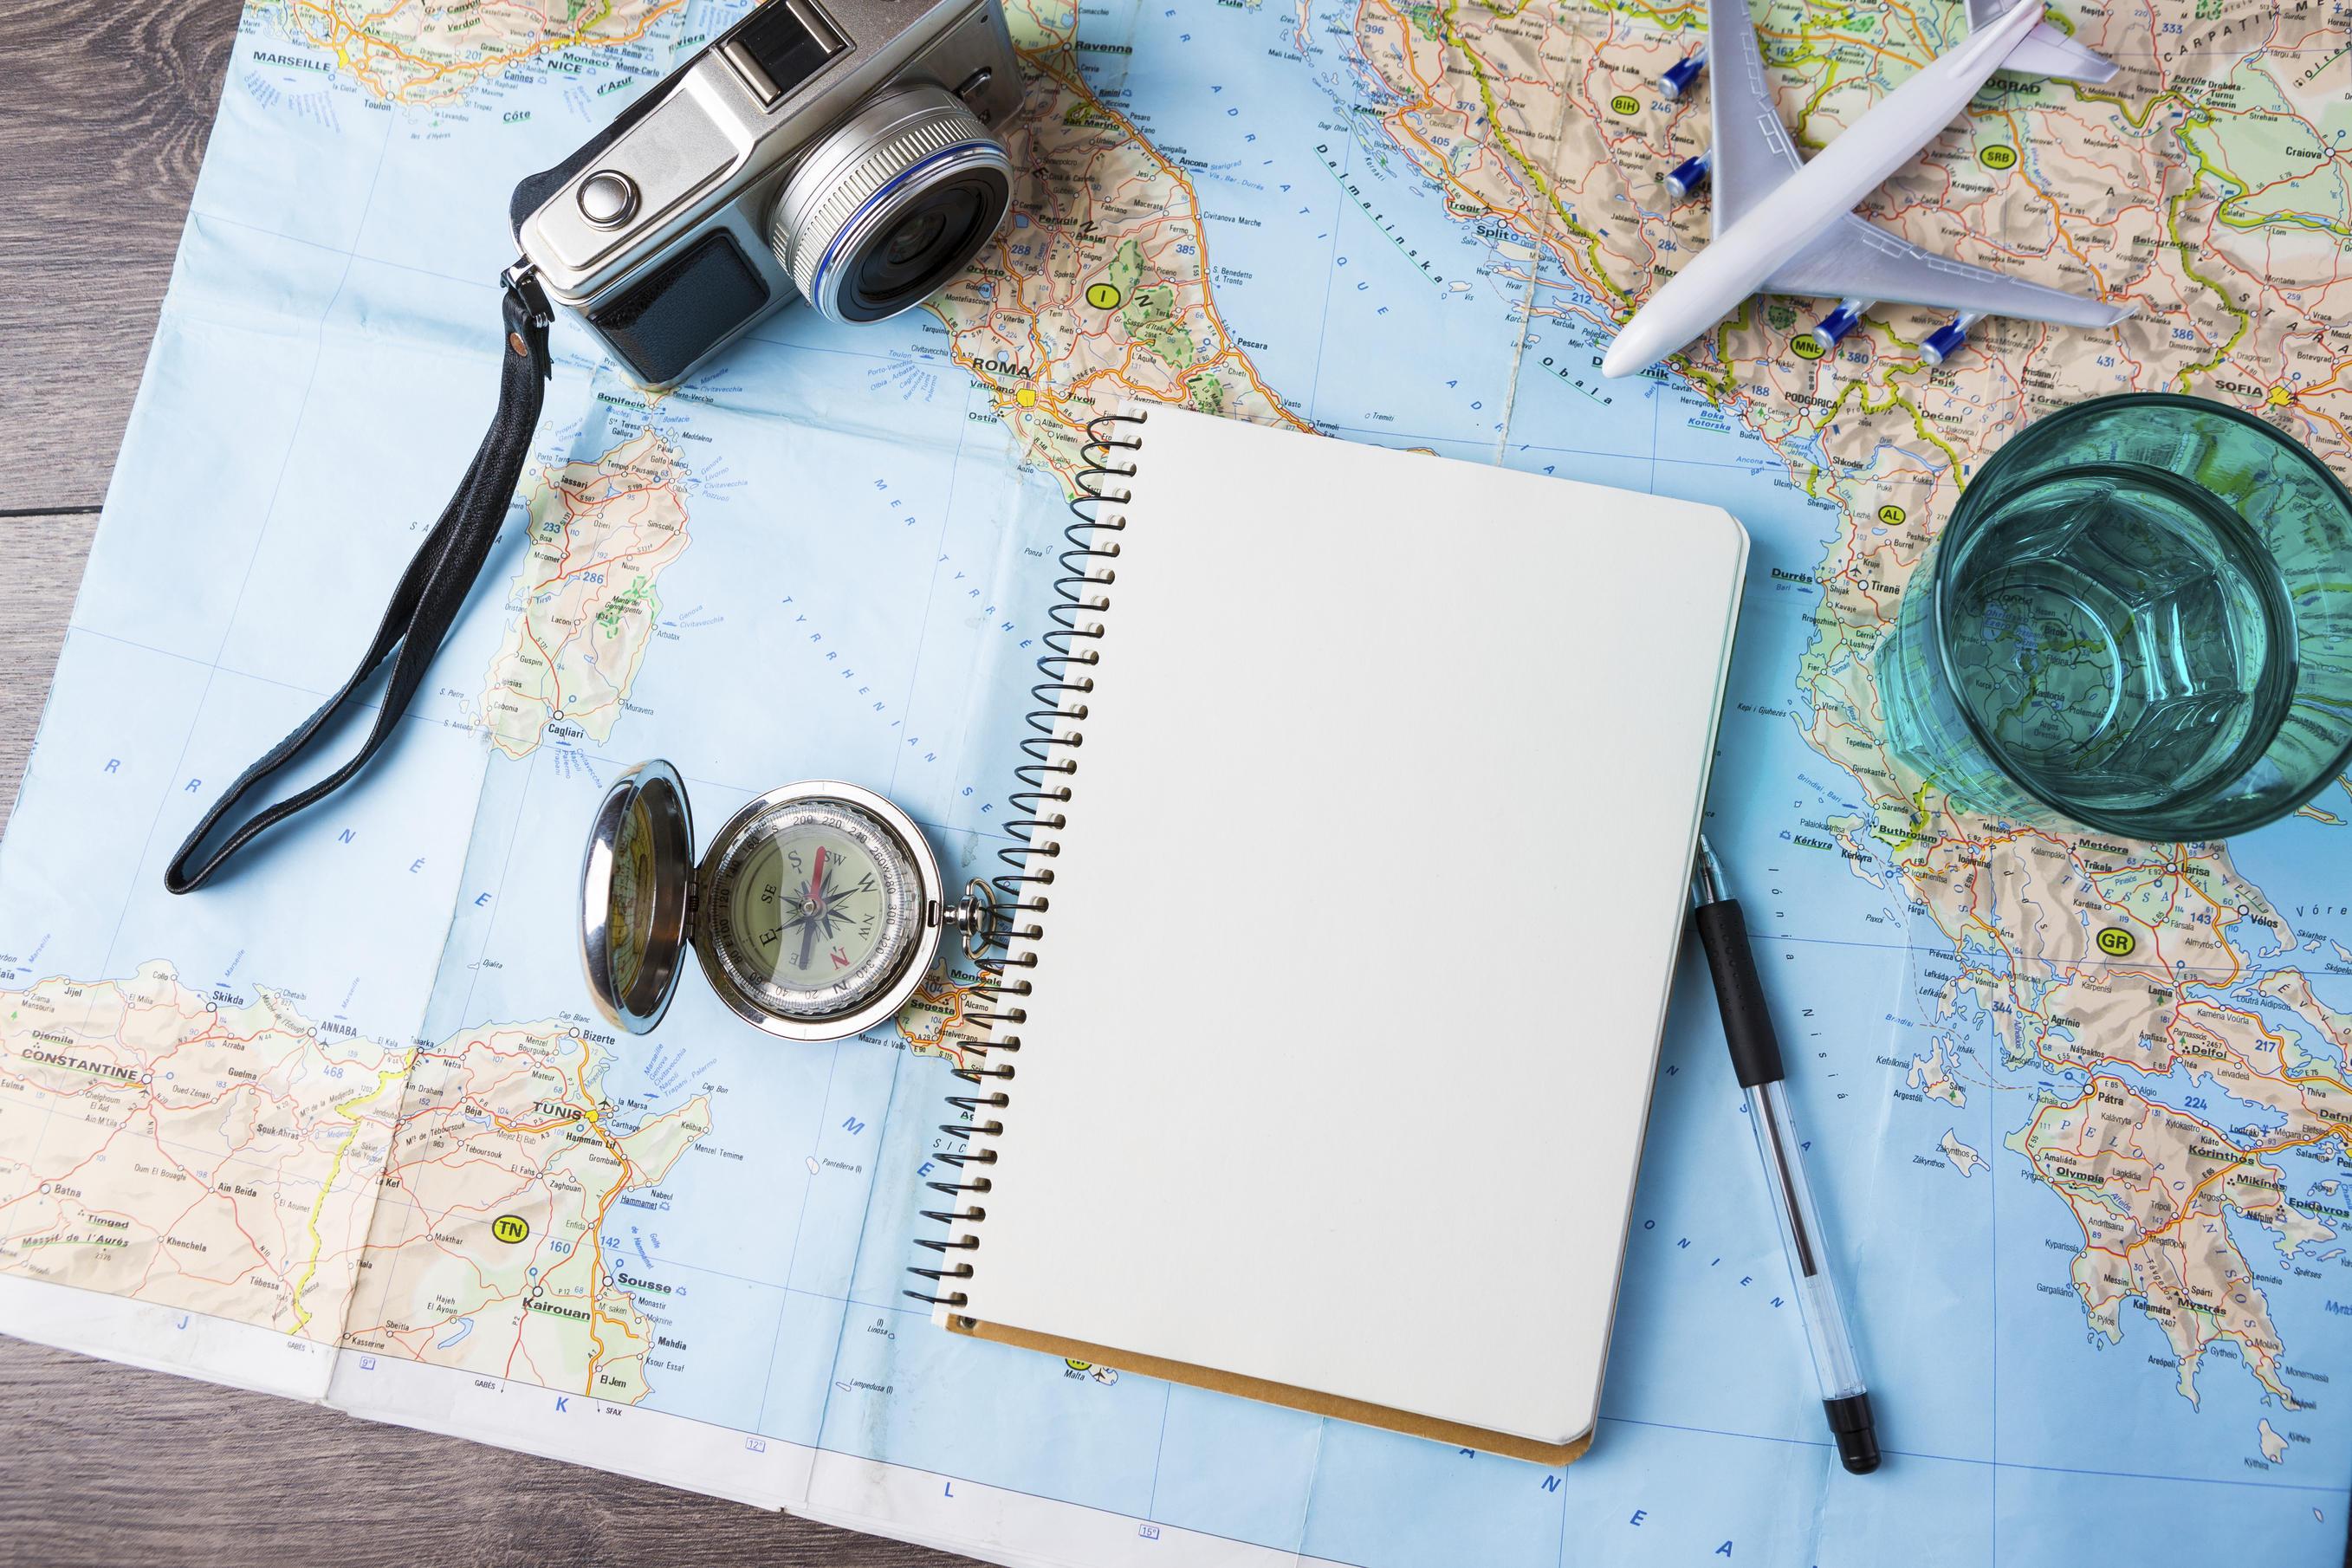 maps, camera, notebook